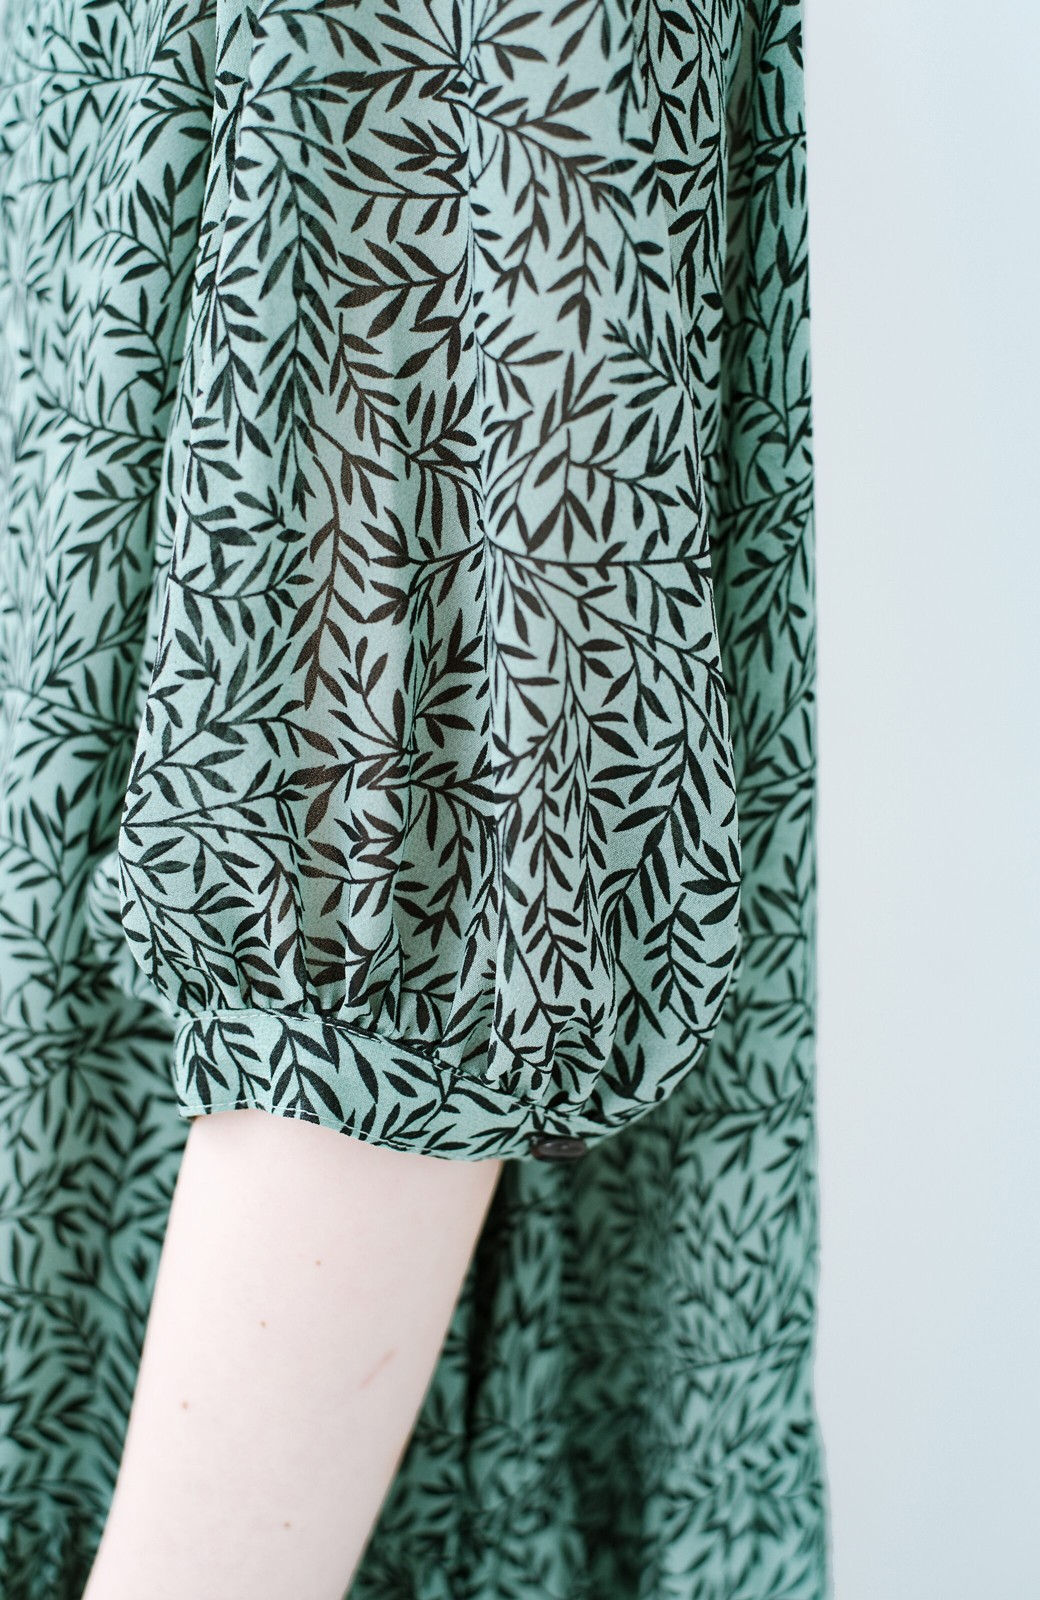 haco! パッと着るだけで映える 柄がかわいいティアードワンピース <グリーン系その他>の商品写真5